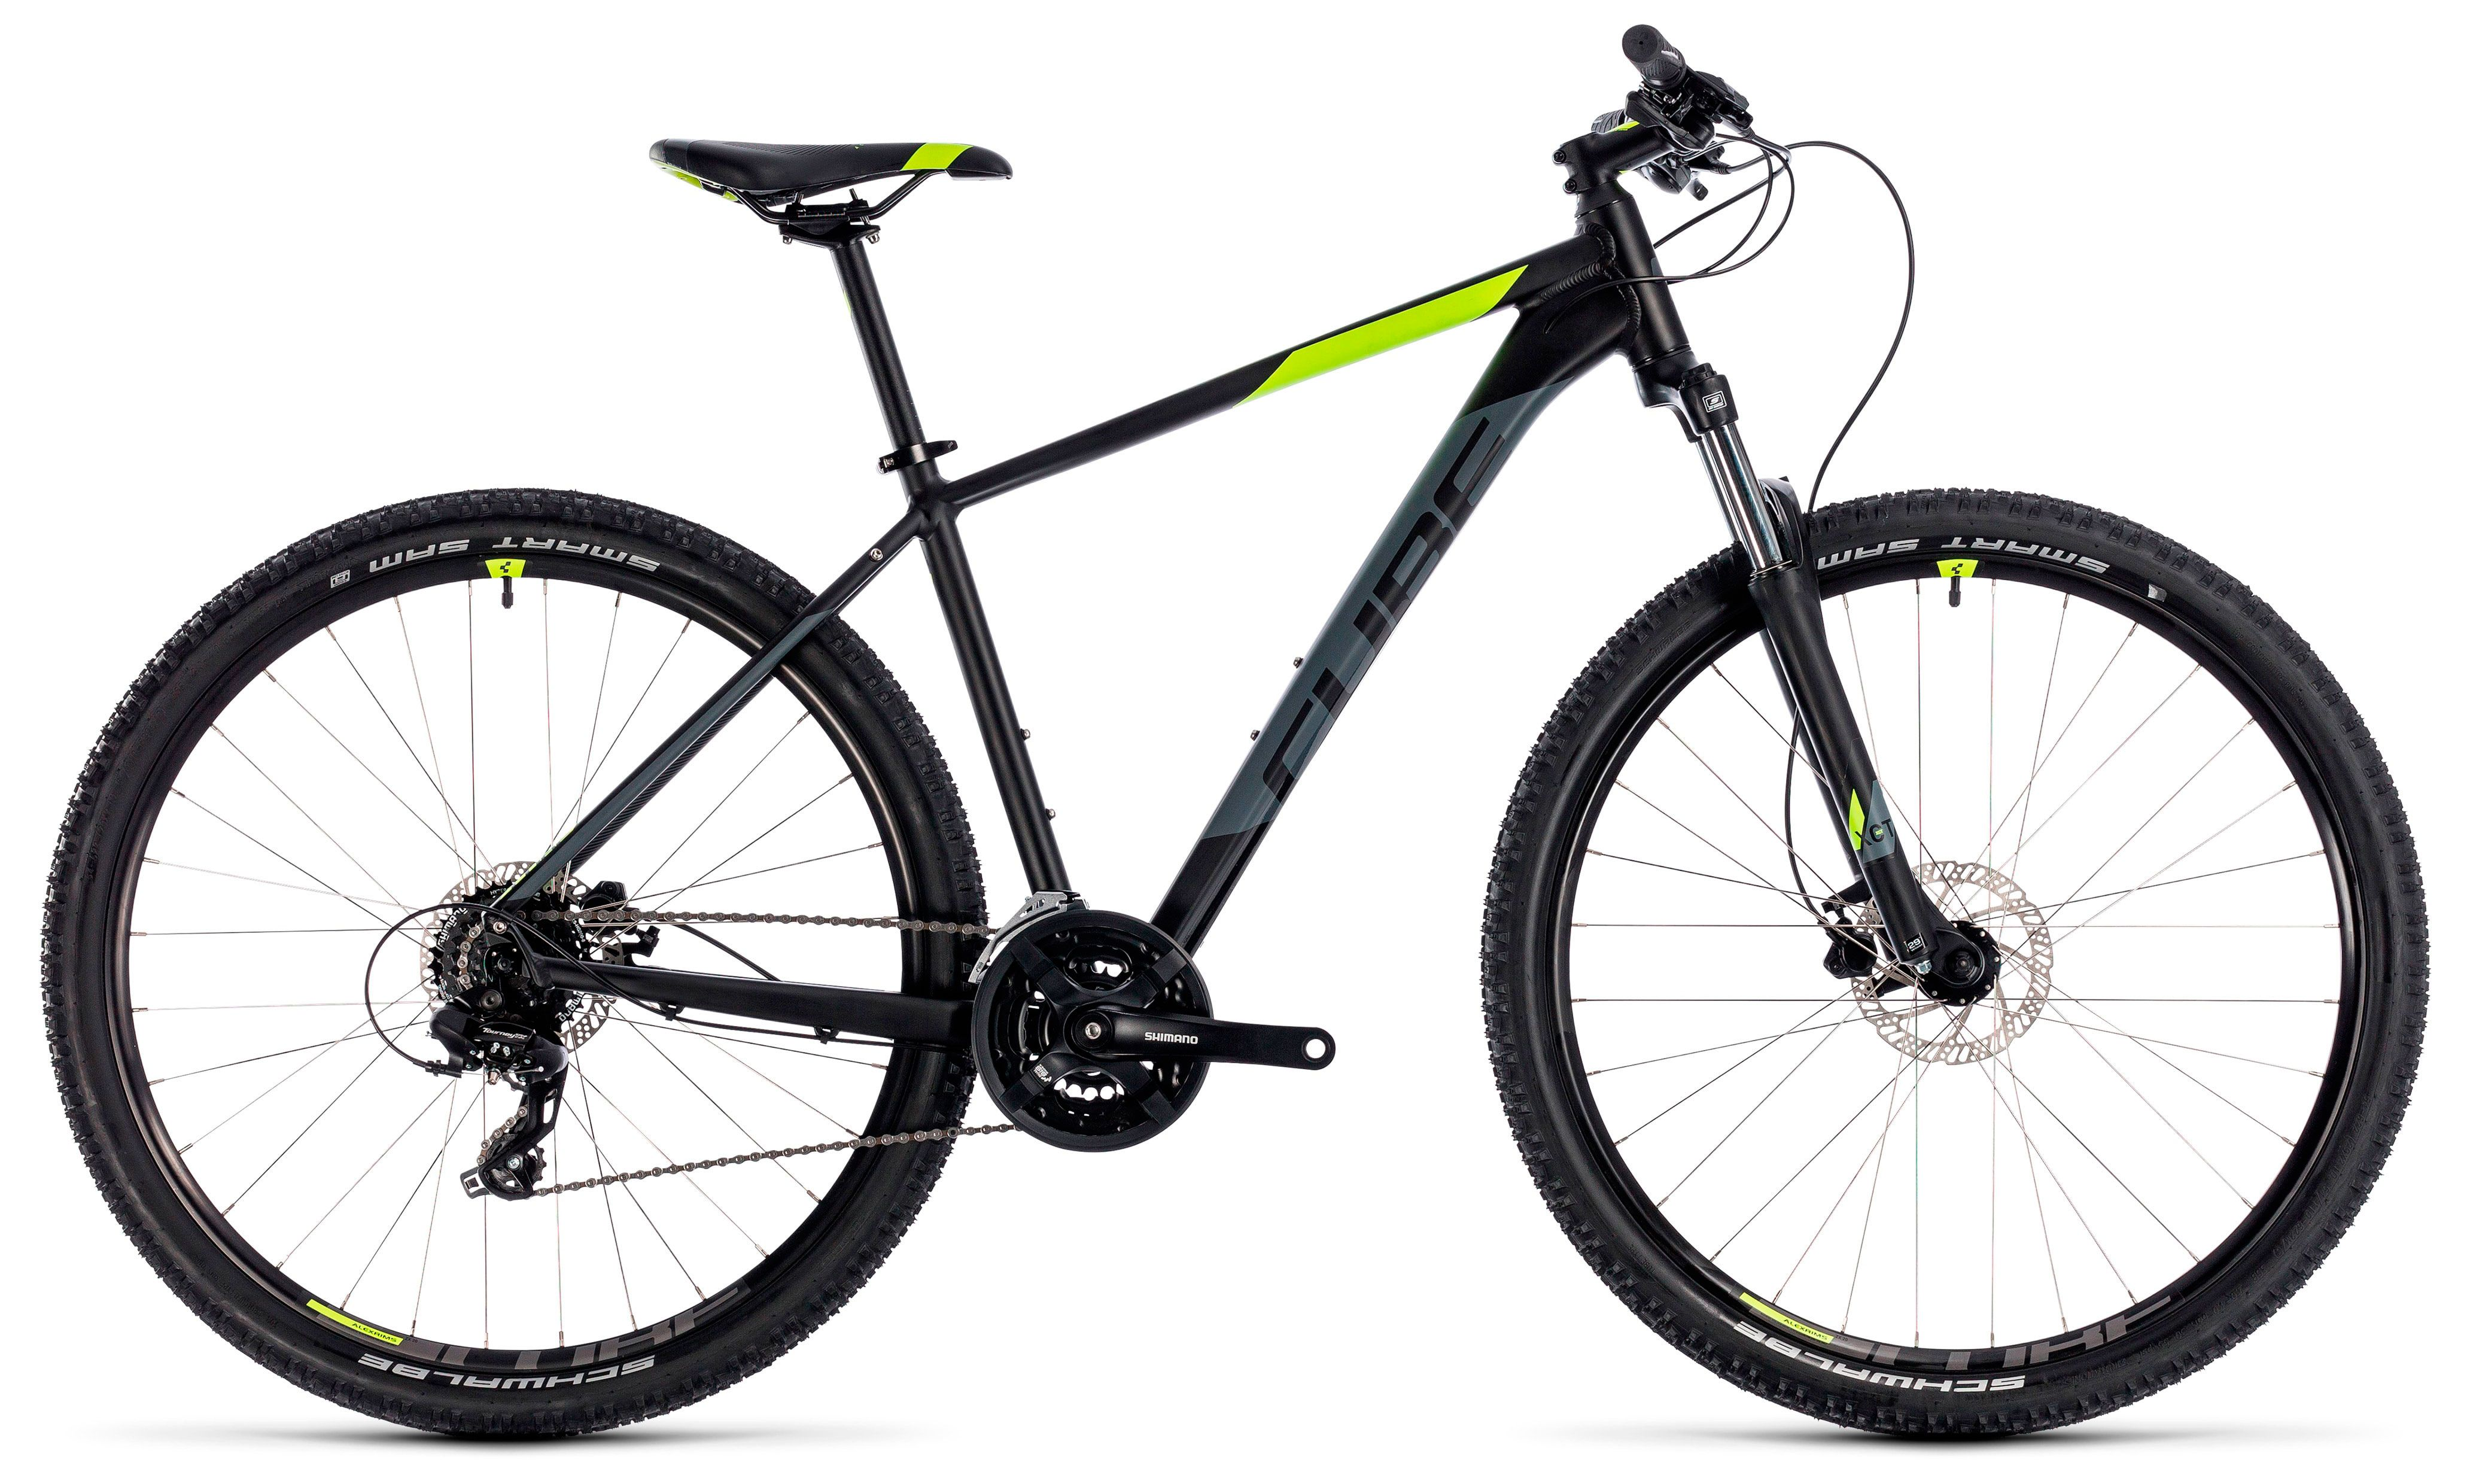 Велосипед Cube AIM Pro 29 2018 велосипед cube aim pro 29 2016